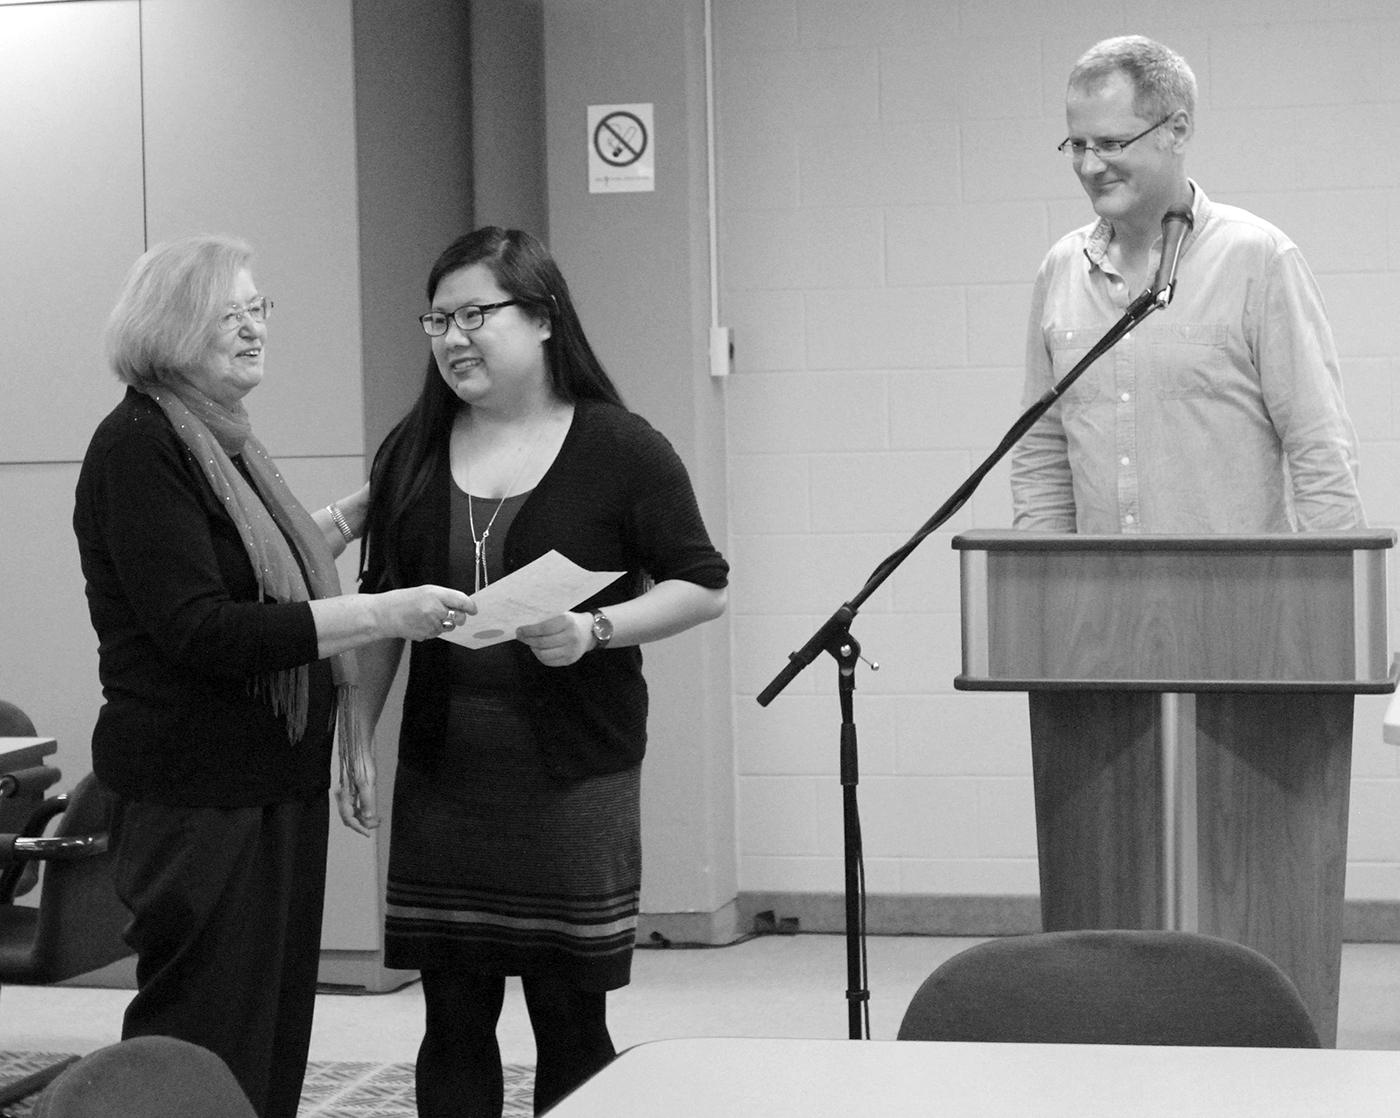 Cheralea Gilbert, Wendy Gu and Nicholas Woolridge. Photo Credit: Sarah (1T6) Kim